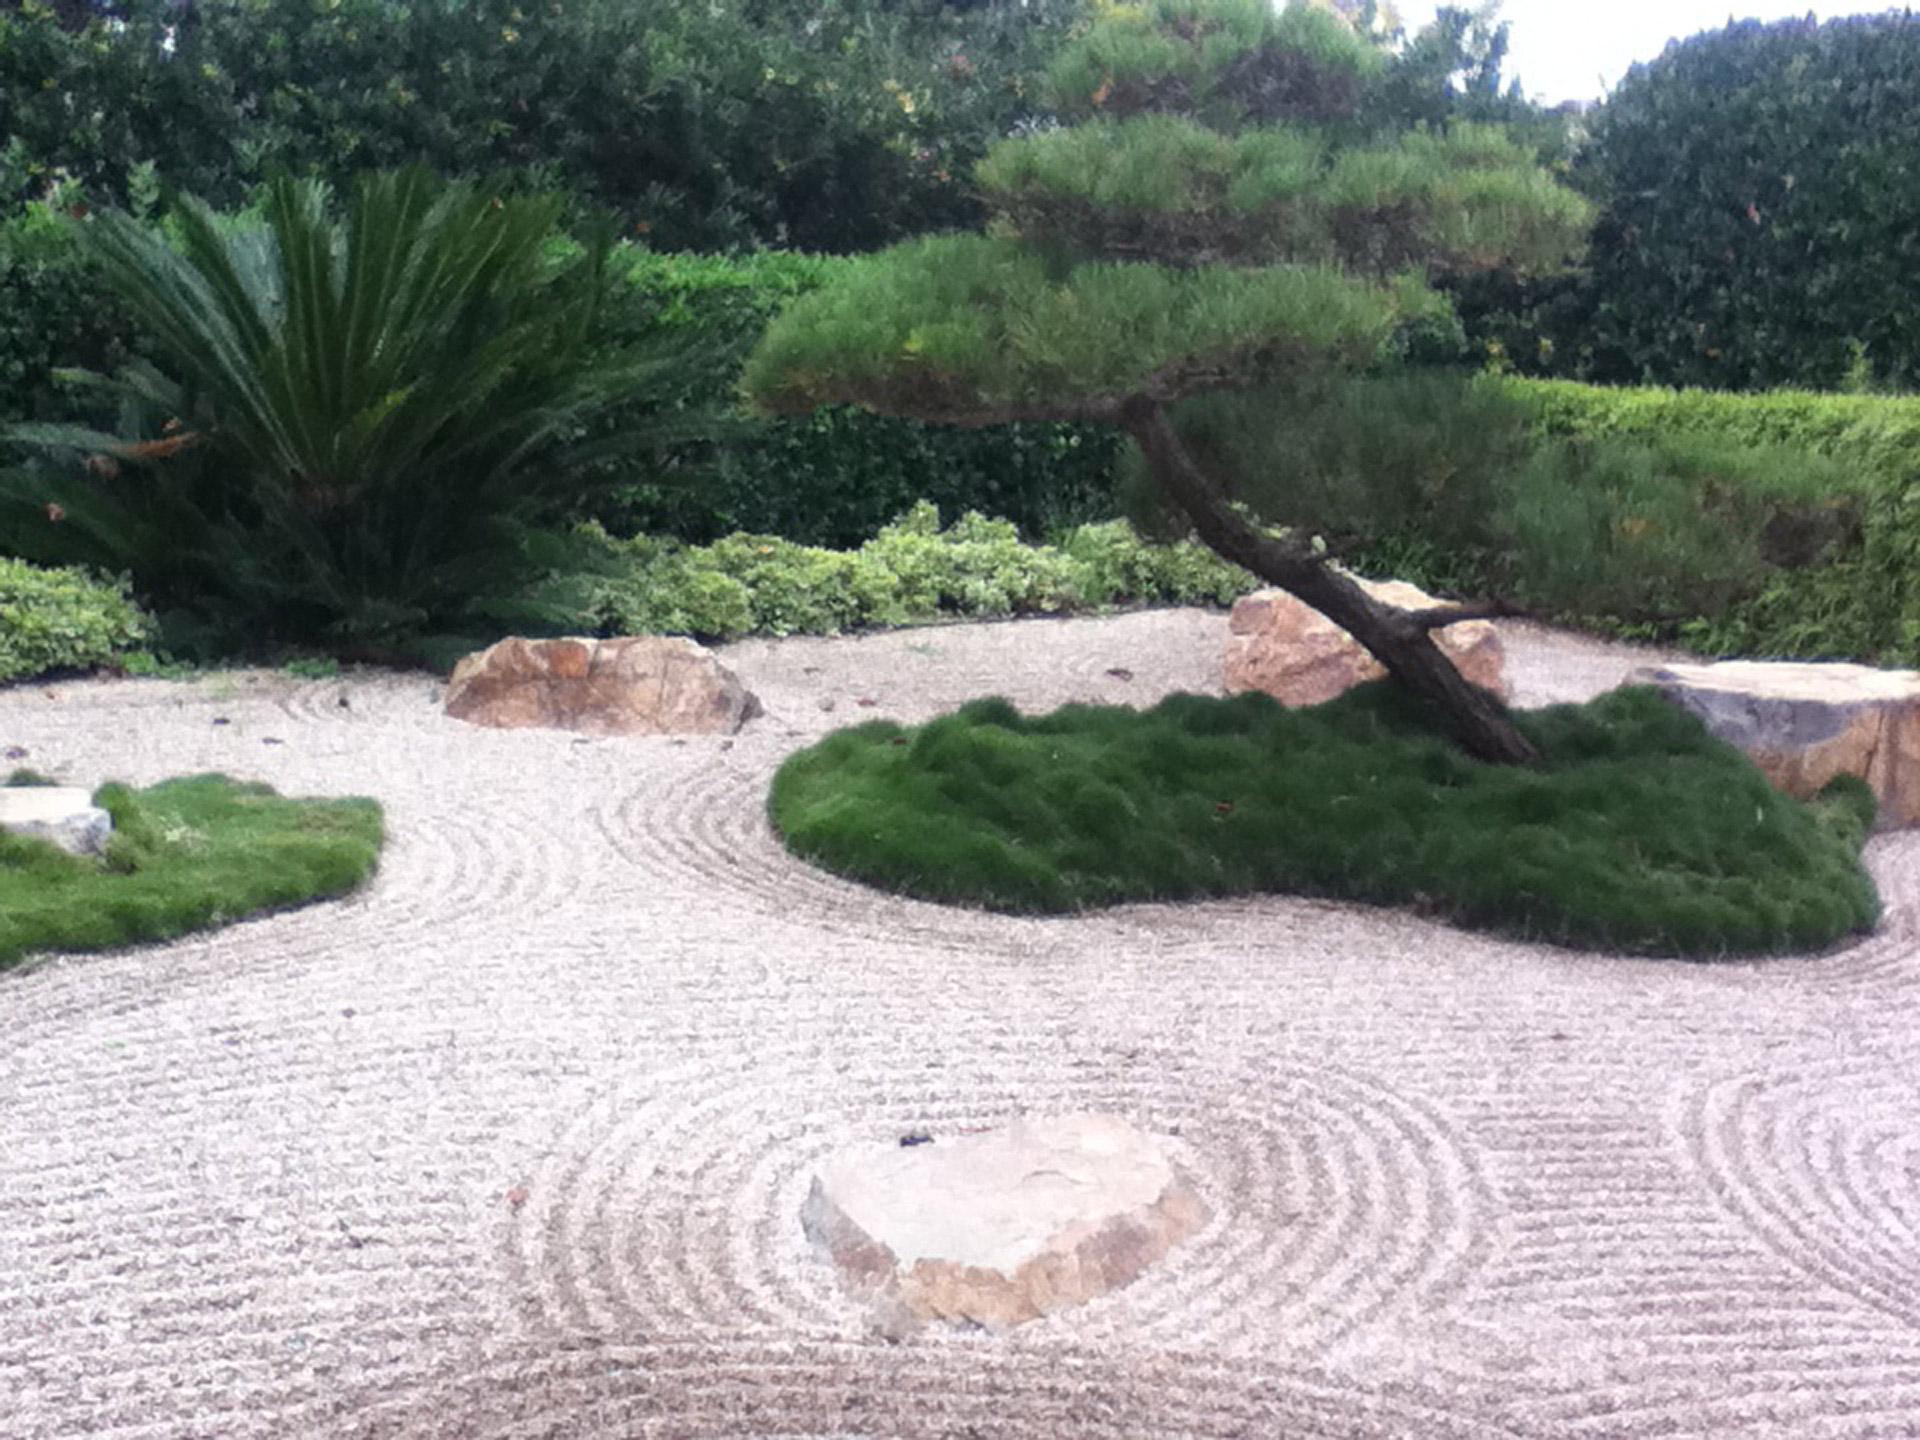 Rock Garden Zen Meditation Buddhist Free Image From Needpix Com